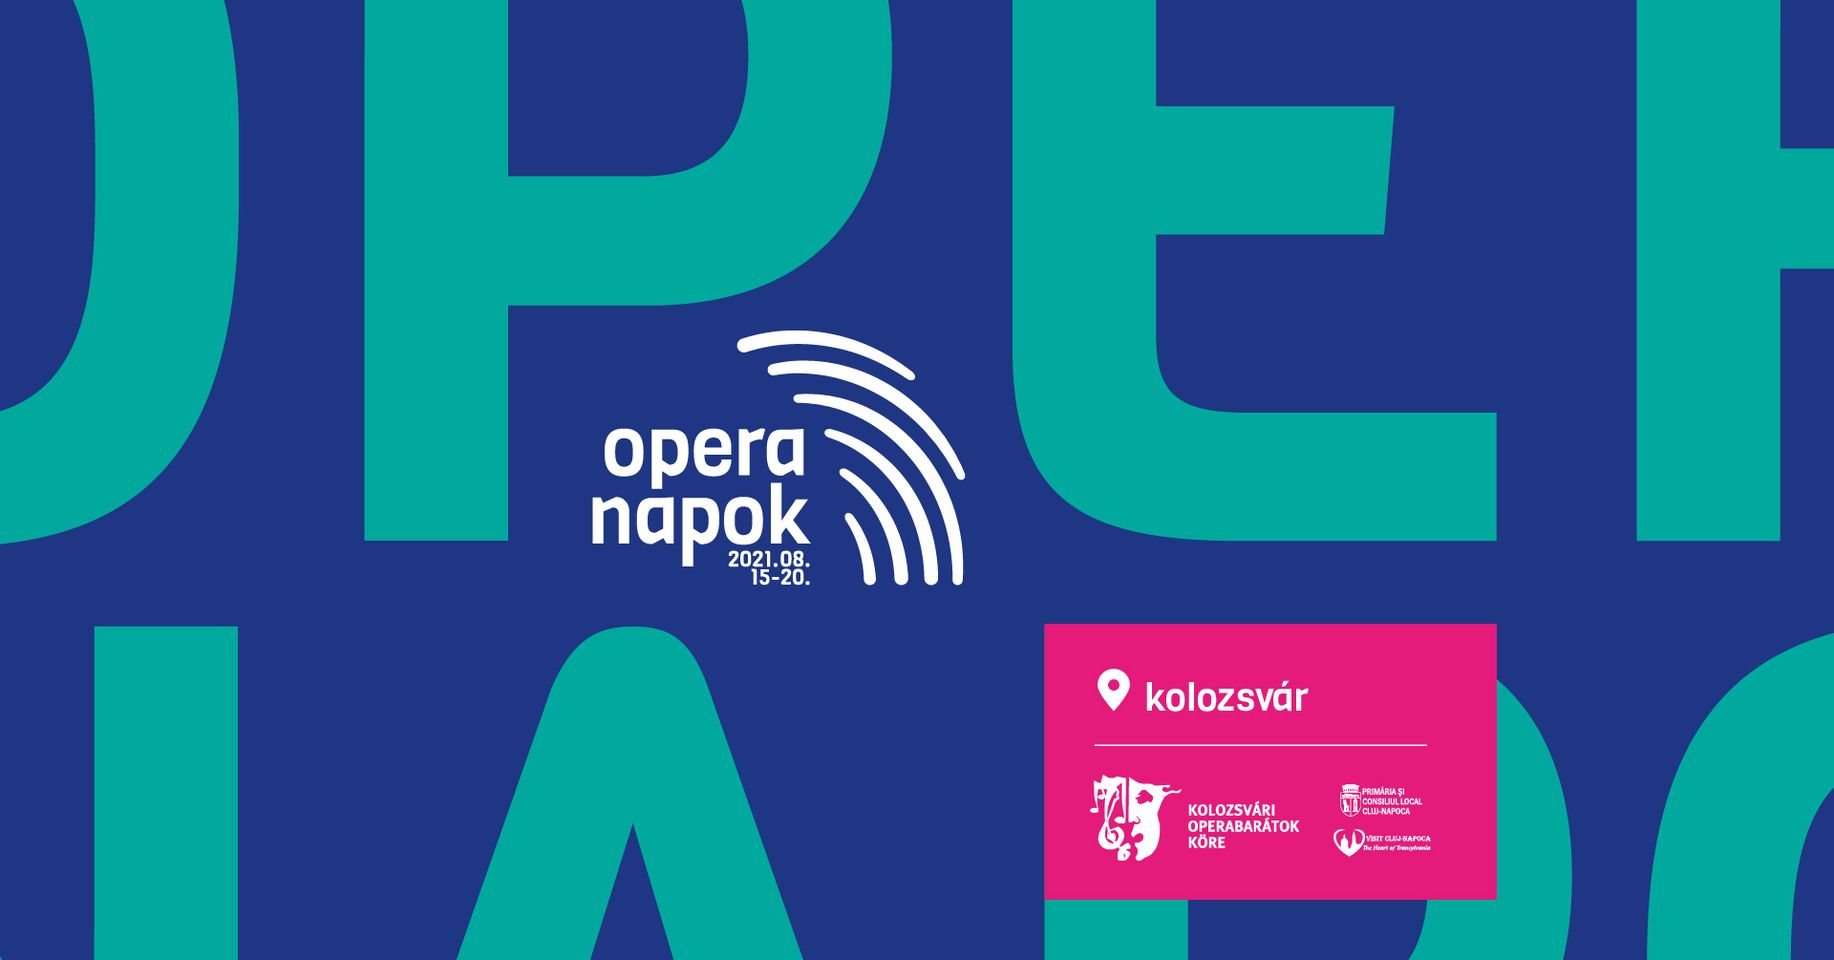 Opera Napok Zilele Operei Maghiare din Cluj